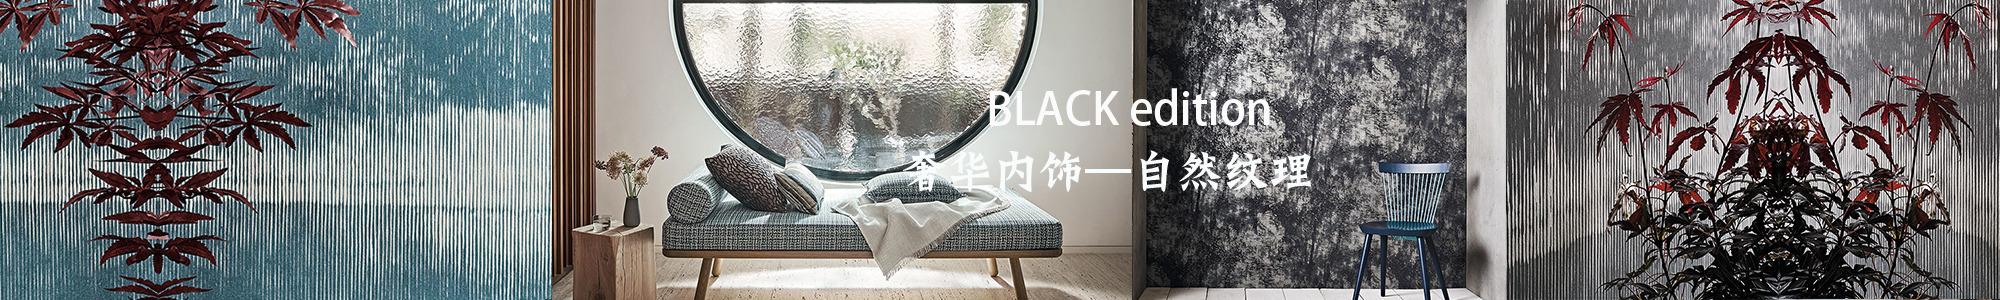 《BLACK edition》2018秋冬软装布艺系列Lookbook